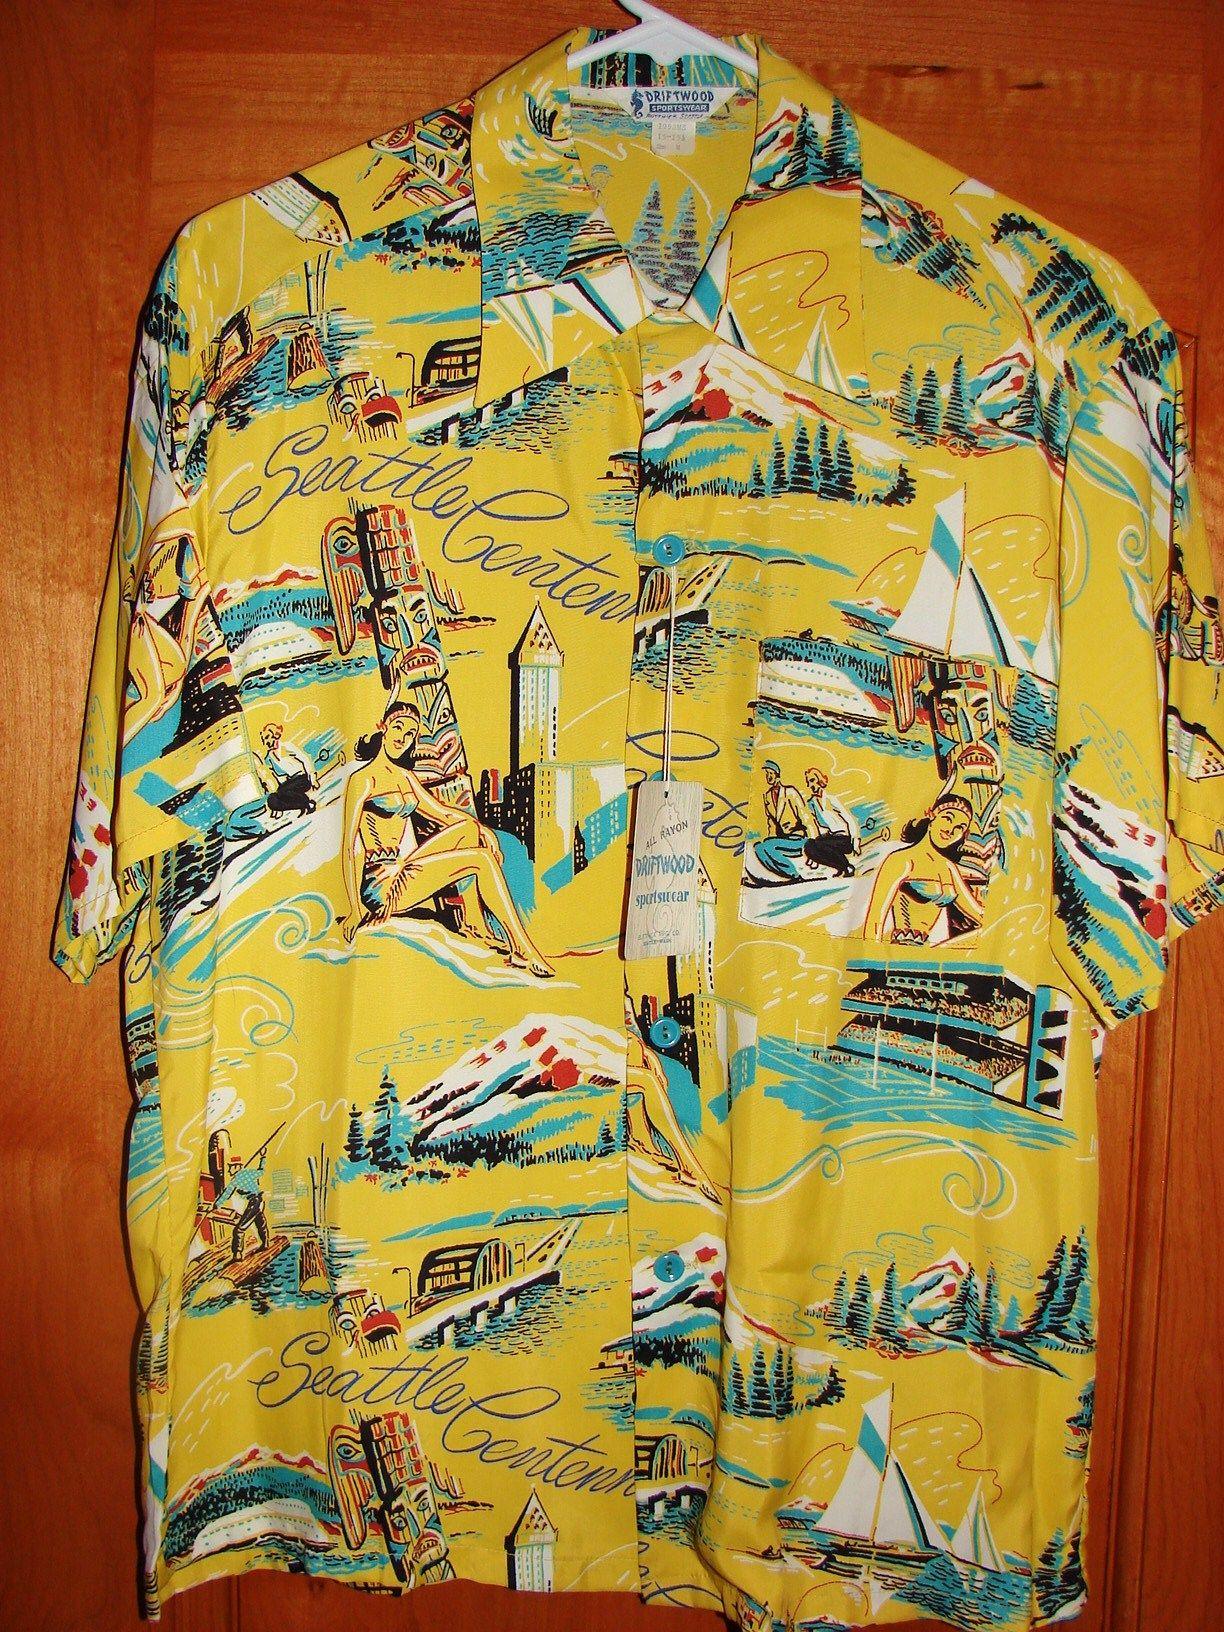 3f5b546b Driftwood - 50s Seattle Rayon Vintage Hawaiian Shirt - TheHanaShirtCo I  have this fabric in blue.